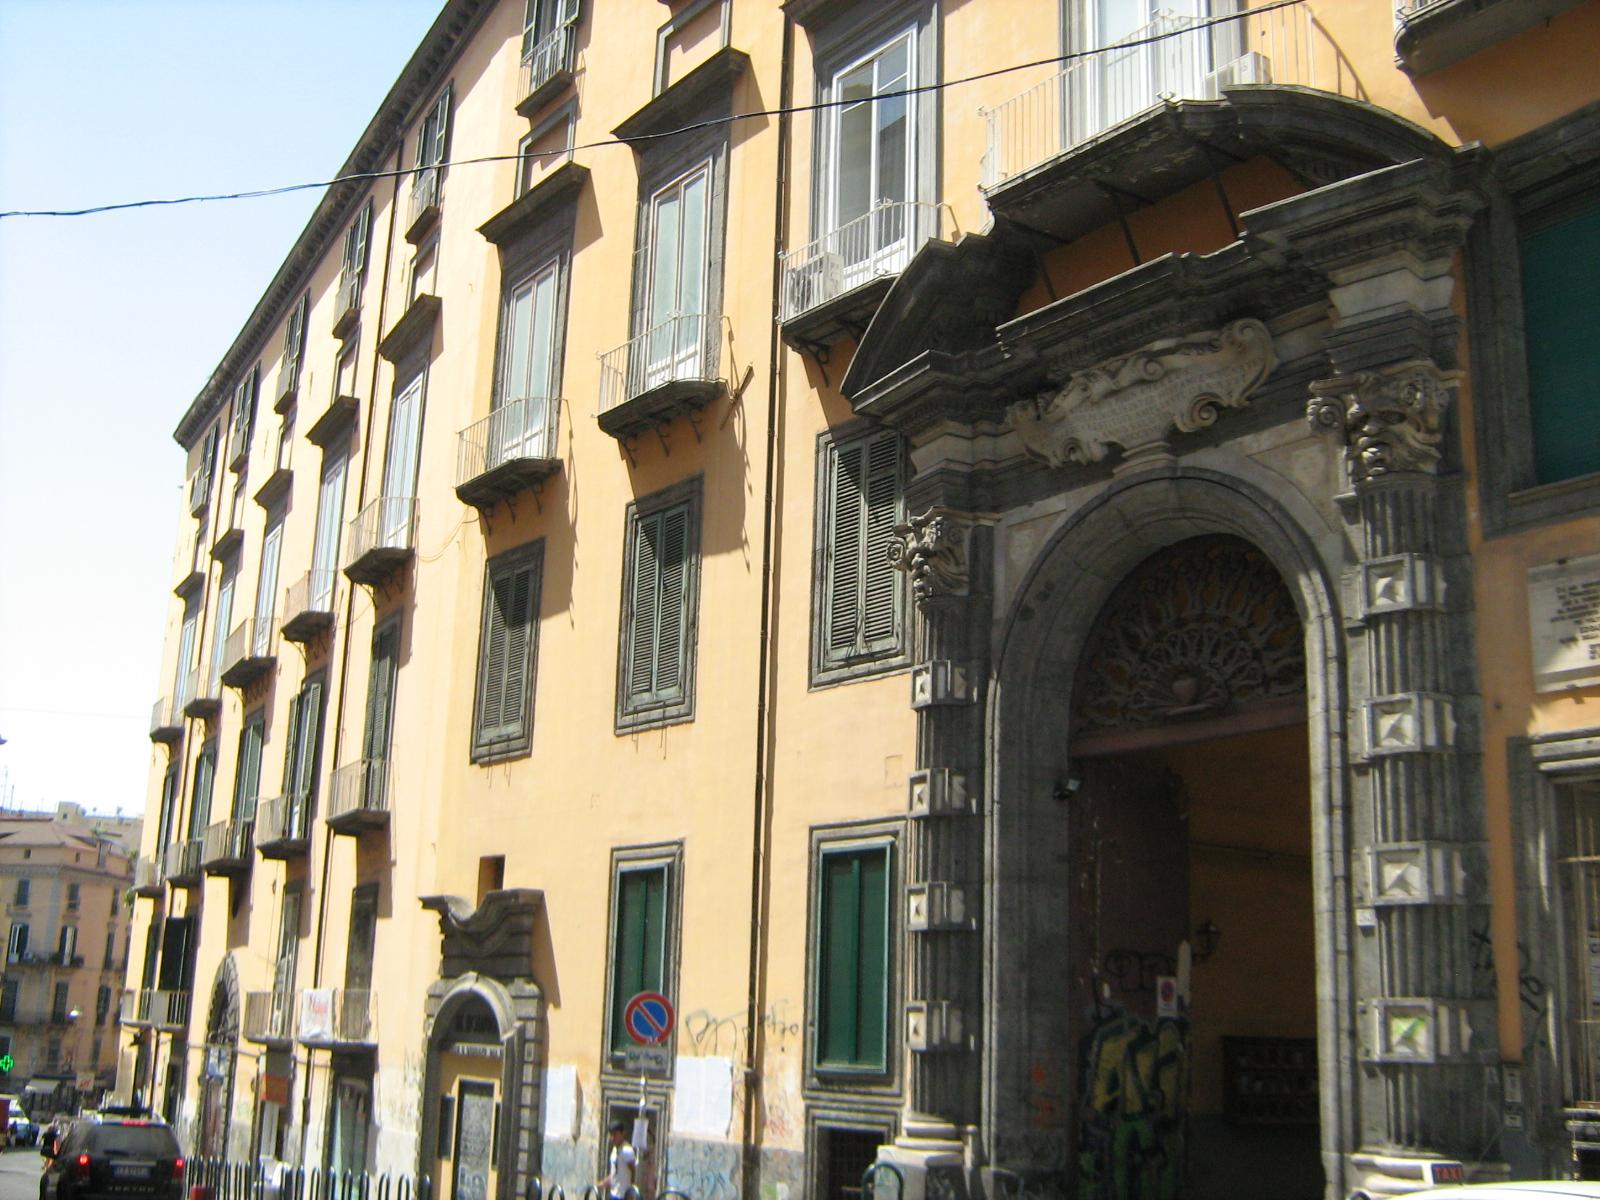 facciata palazzo pignatelli monteleone napoli